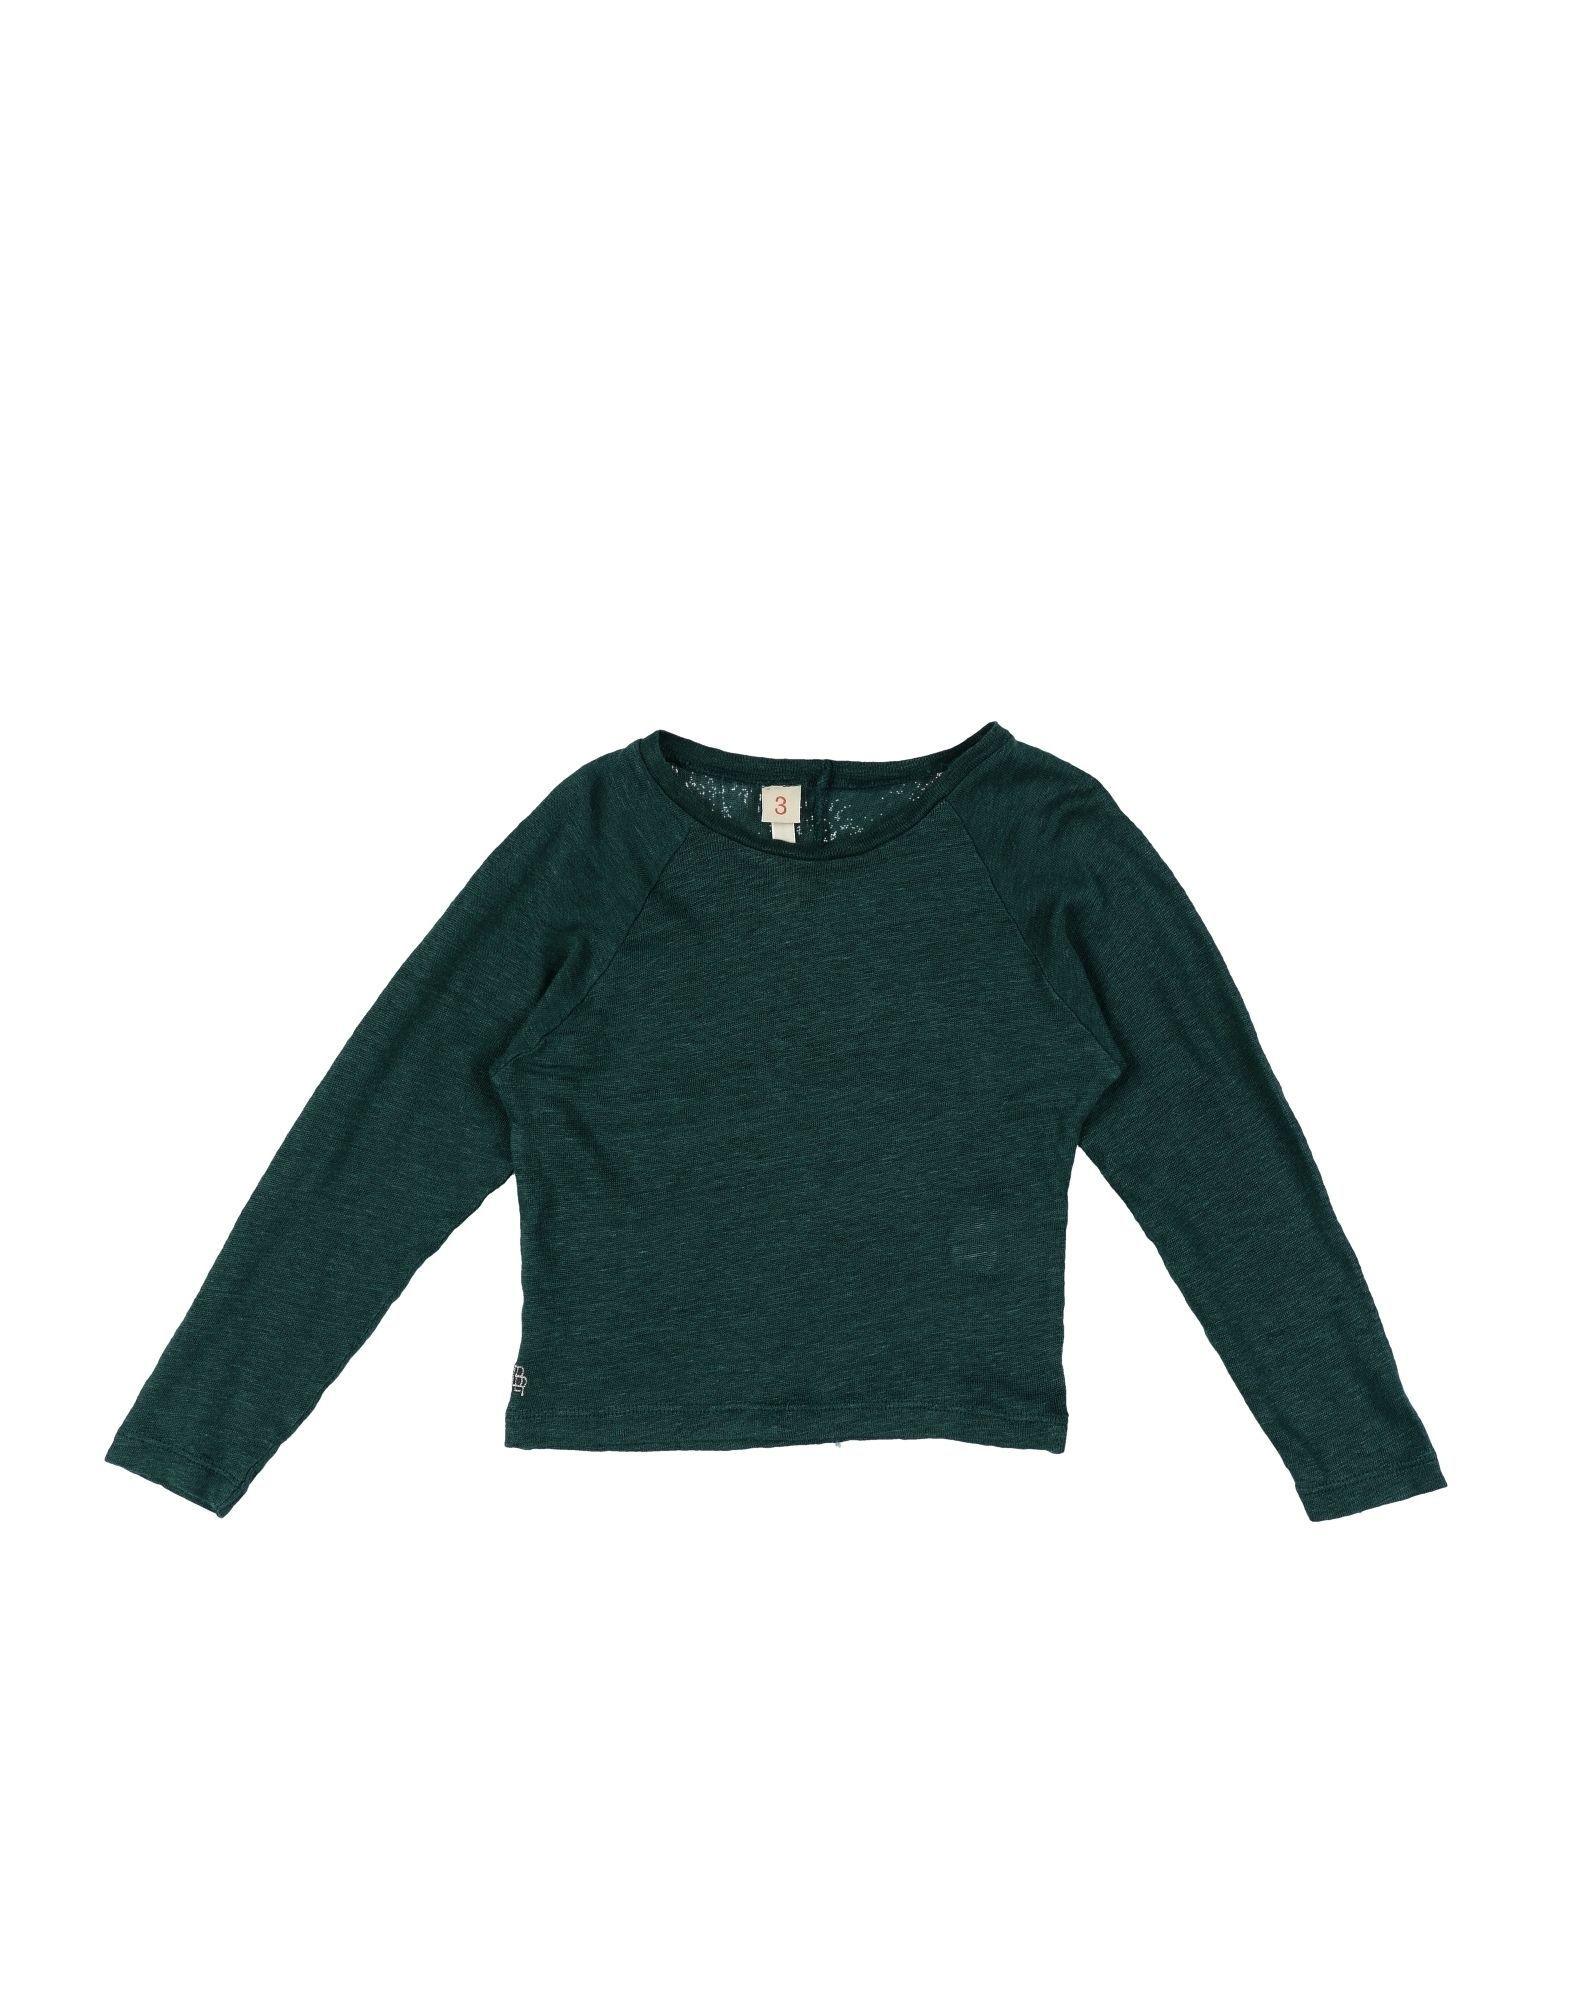 KNITWEAR Bellerose Emerald green Girl Linen